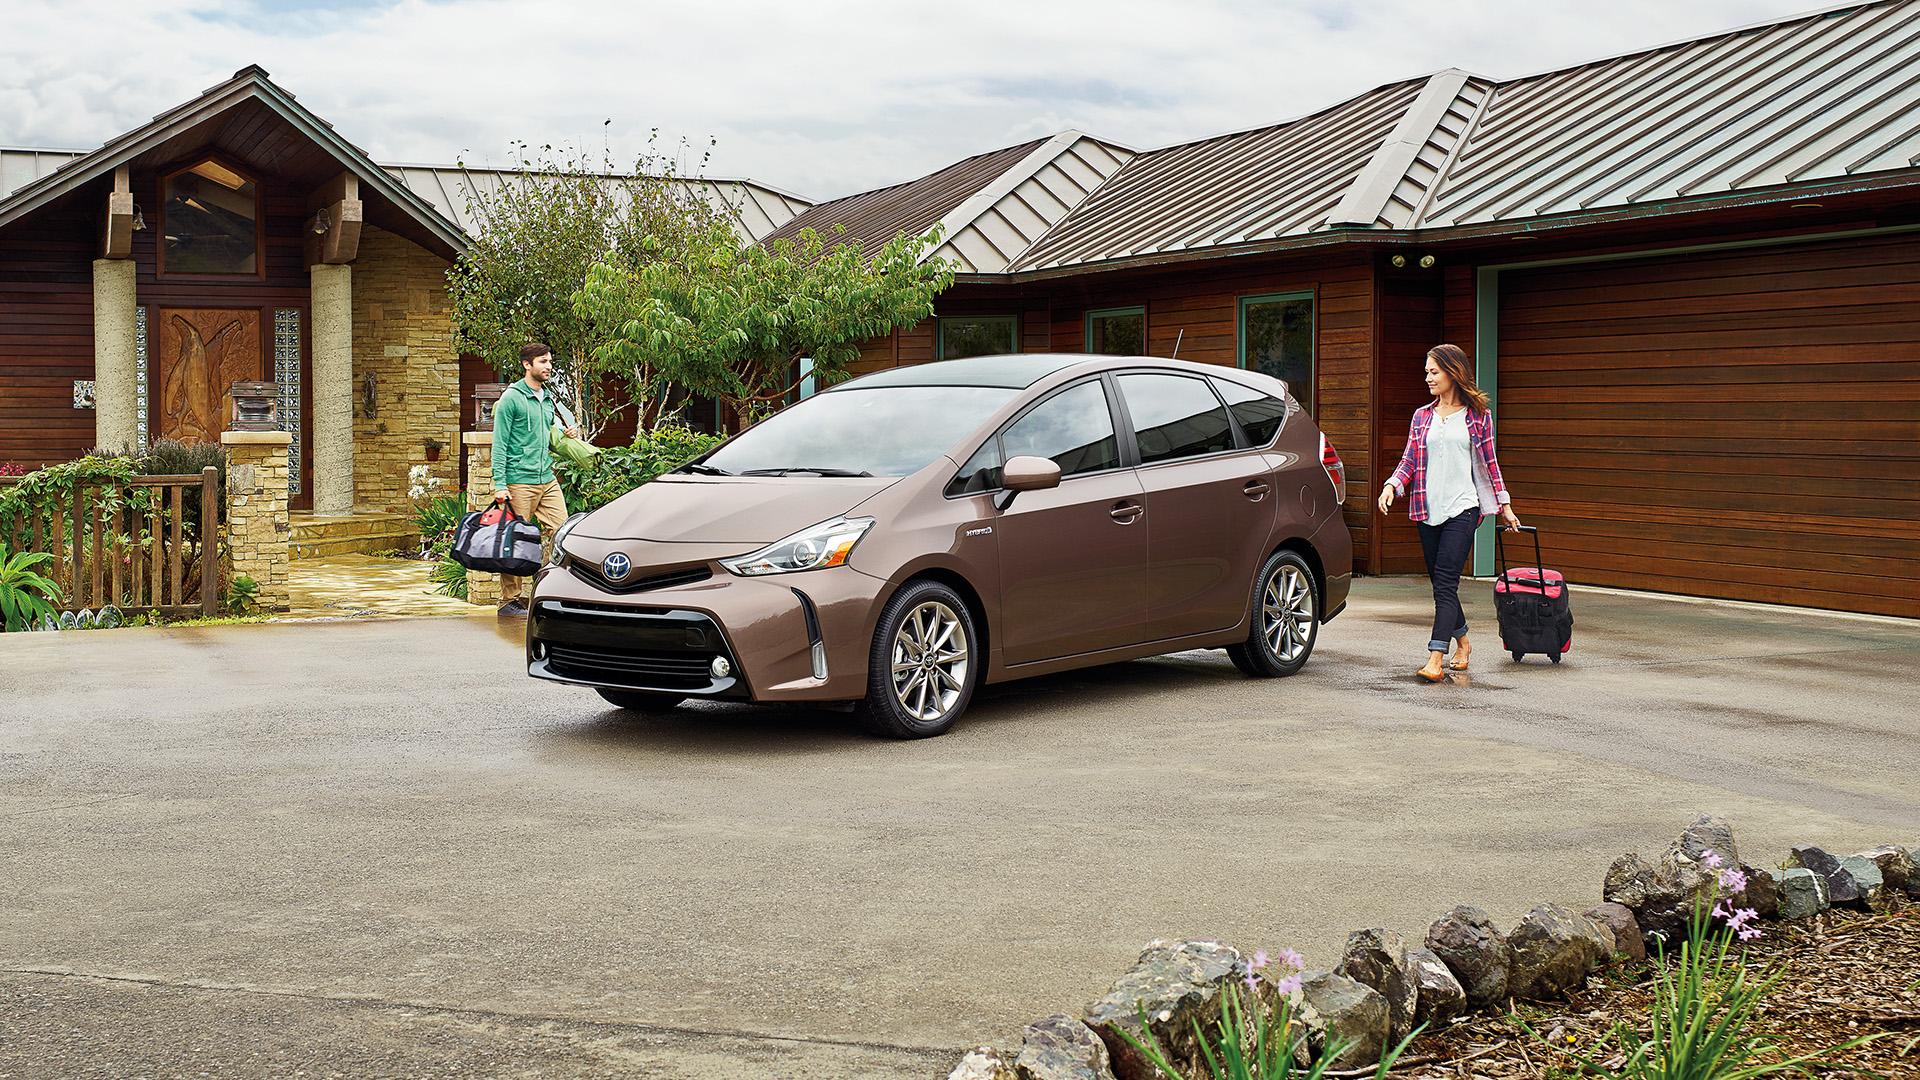 2016 Toyota Prius V parked